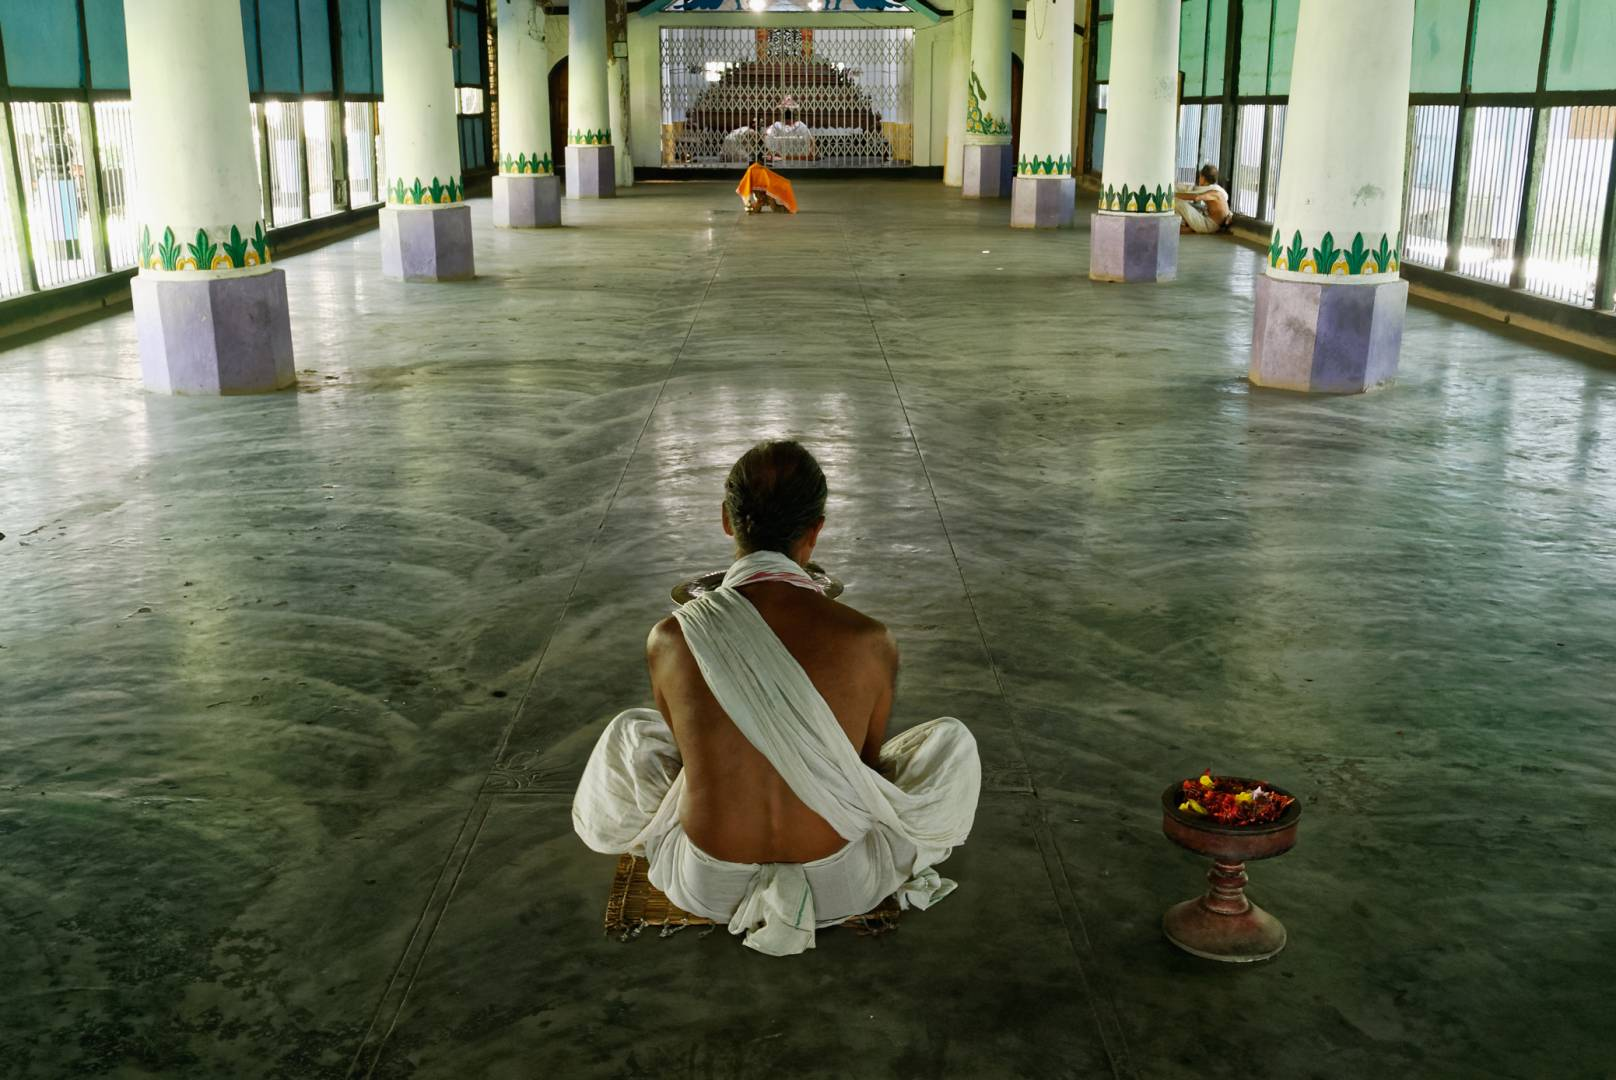 Inside the prayer hall of Uttar Kamalabari Satra